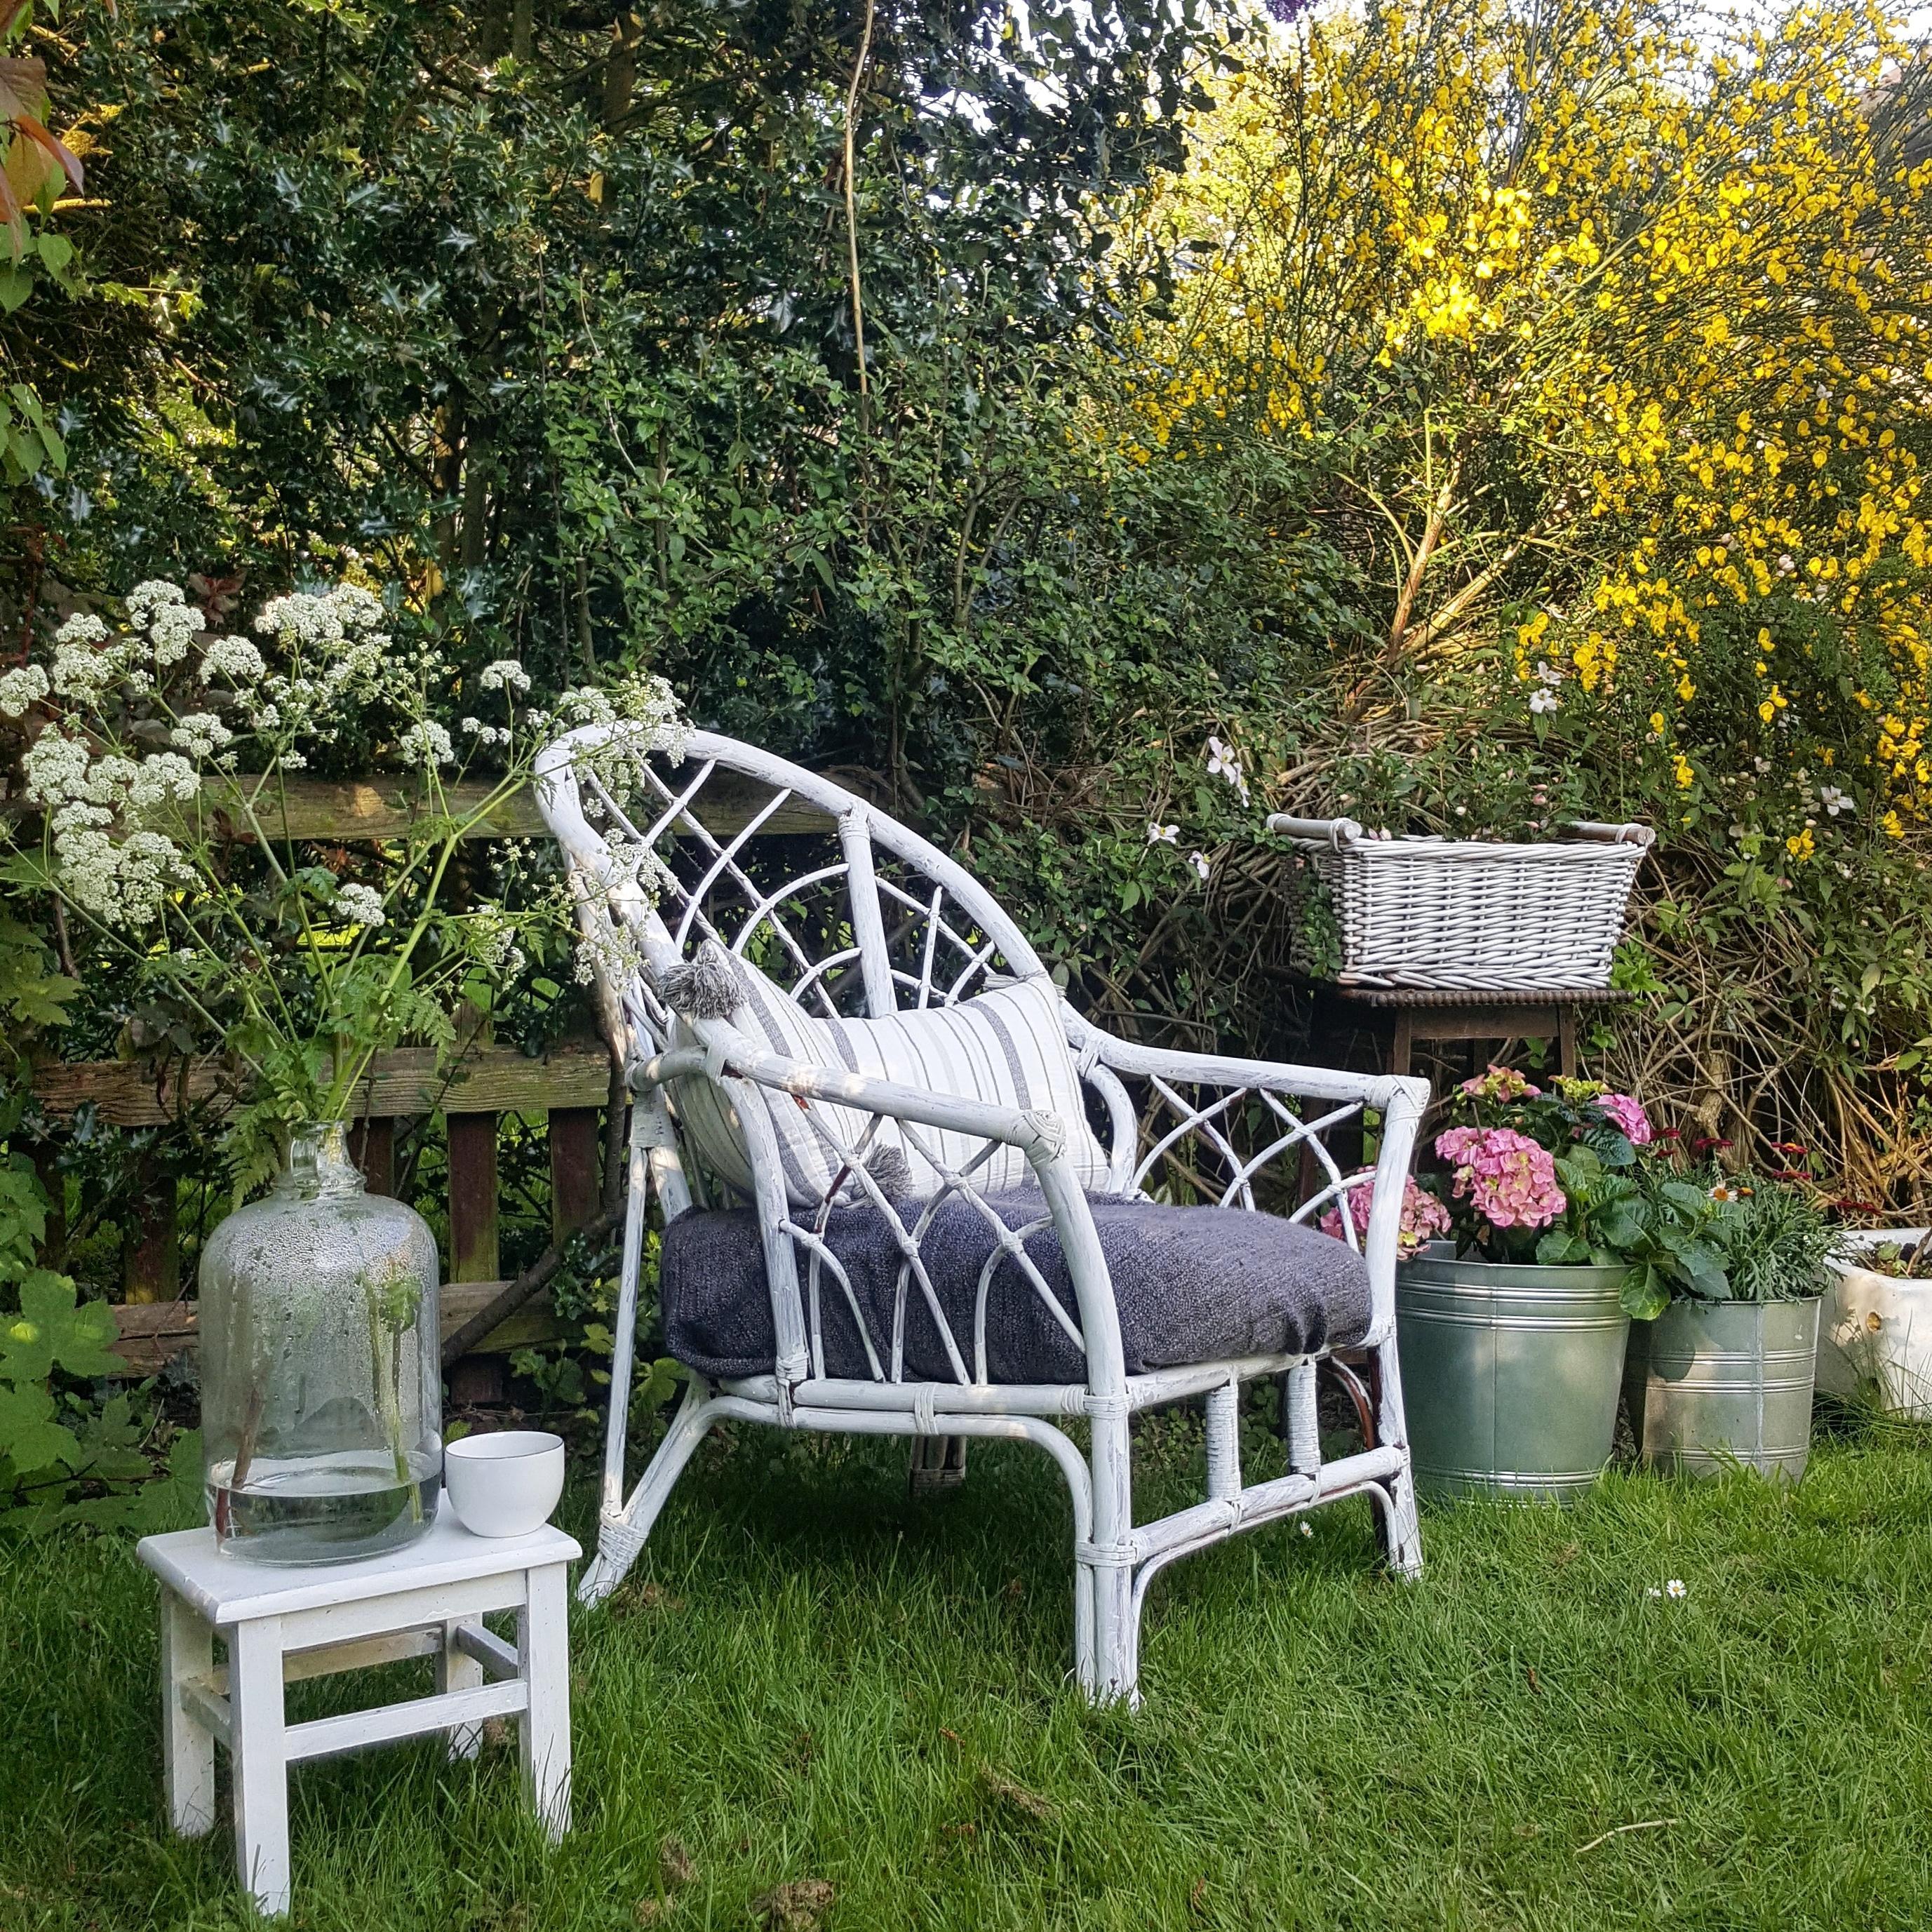 Fruhling Diy Rattan Deko Garten Couch